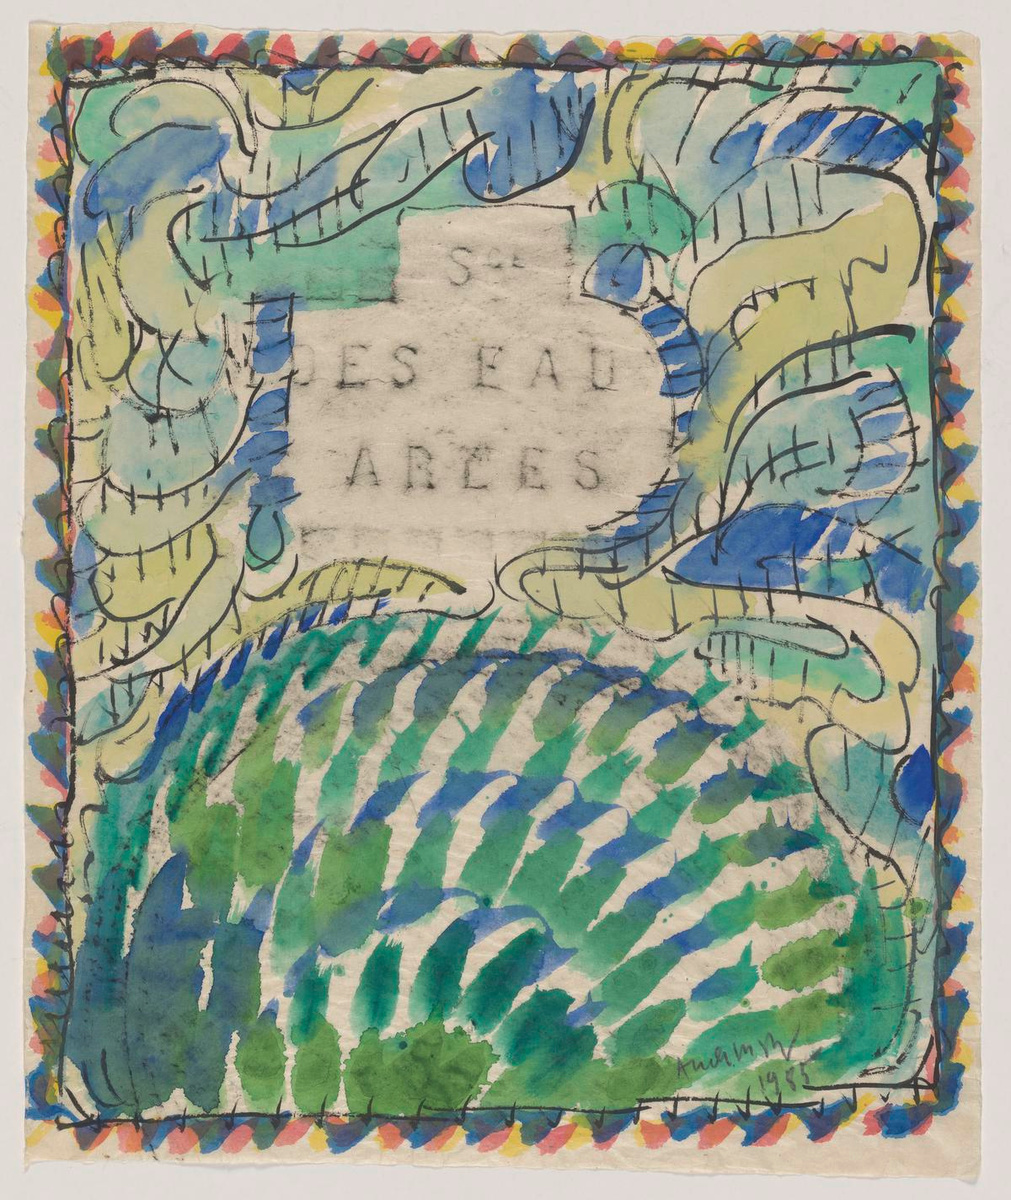 Service des eaux, Arles, Pierre ALECHINSKY (1985). Stempel, Oost-Indische inkt en aquarel op Chinees papier., KMSKB, Brussel / Courtesy of the artist | foto: J. Geleyns - Art Photography